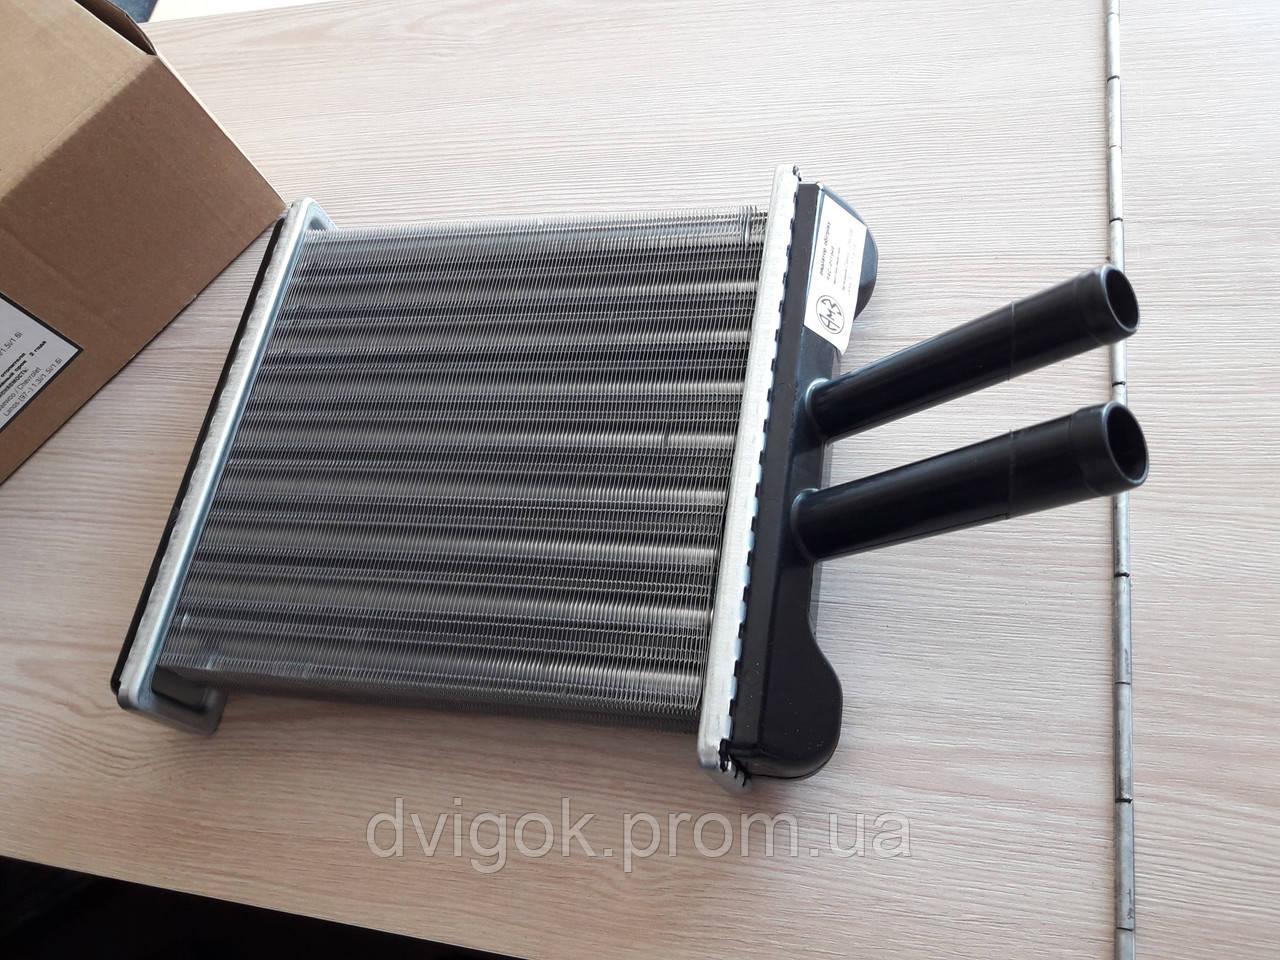 Радиатор печки Daewoo Lanos ЗАЗ Ланос ЗАЗ Сенс (пр-ва АМЗ)